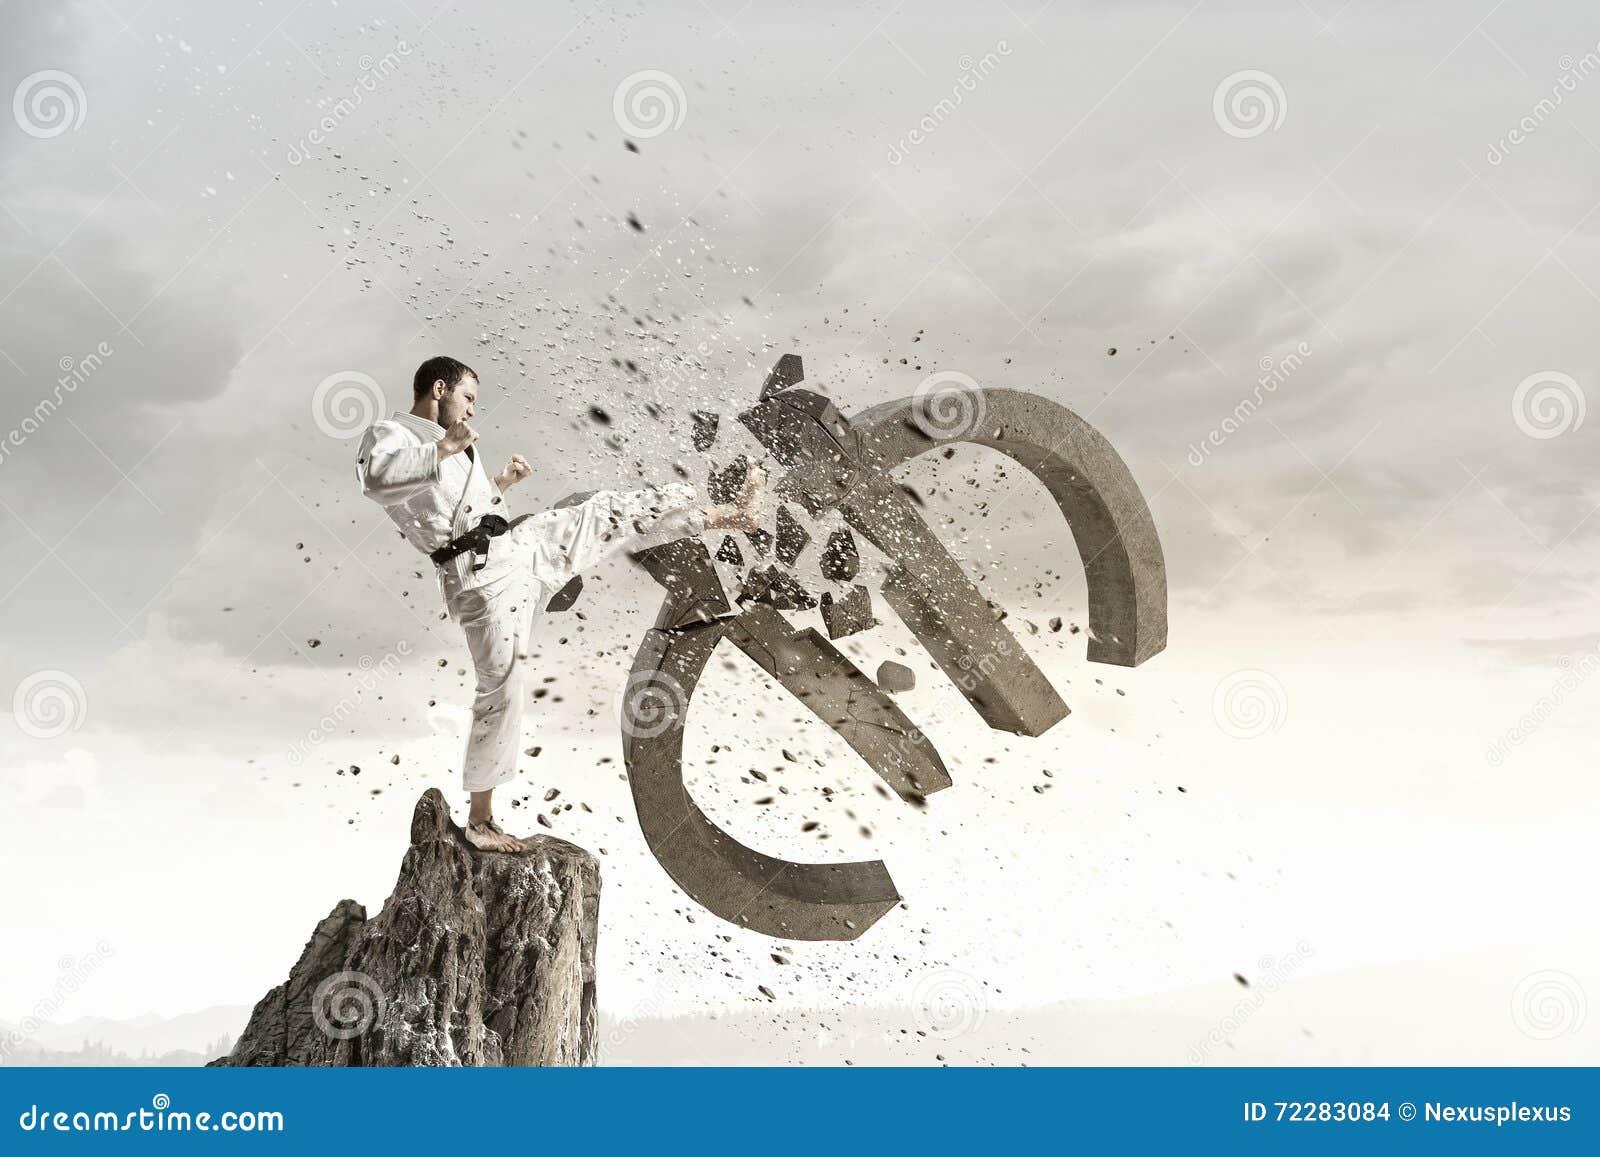 Download Евро нападения человека карате Стоковое Фото - изображение насчитывающей карате, конфликт: 72283084